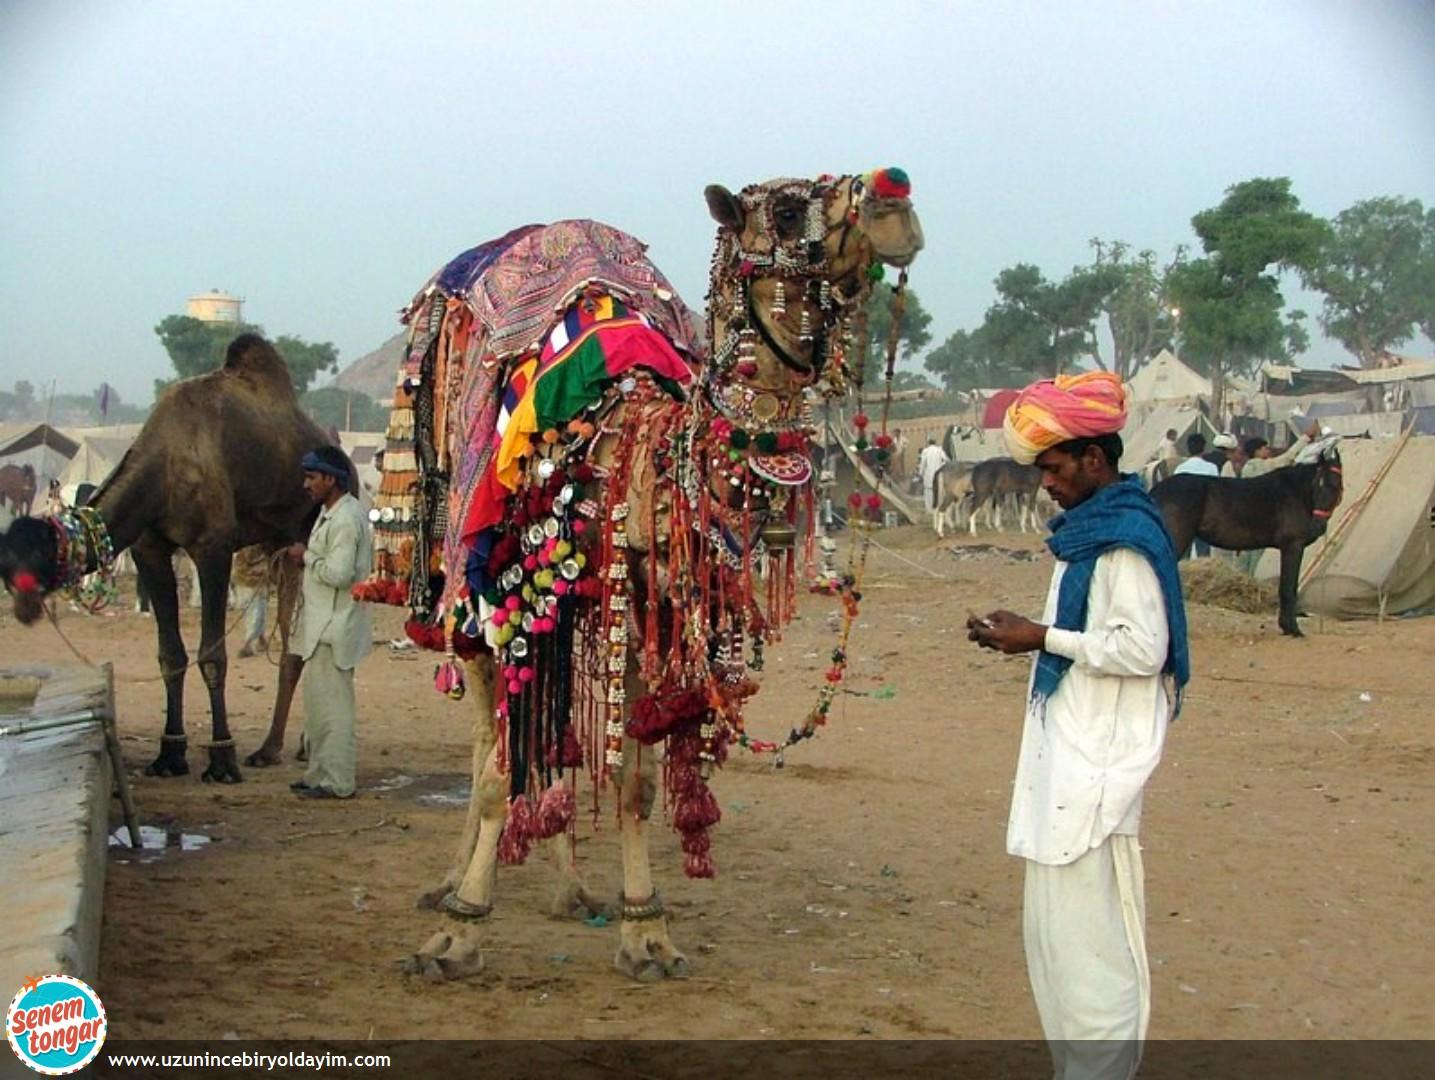 Pushkar Deve Festivali